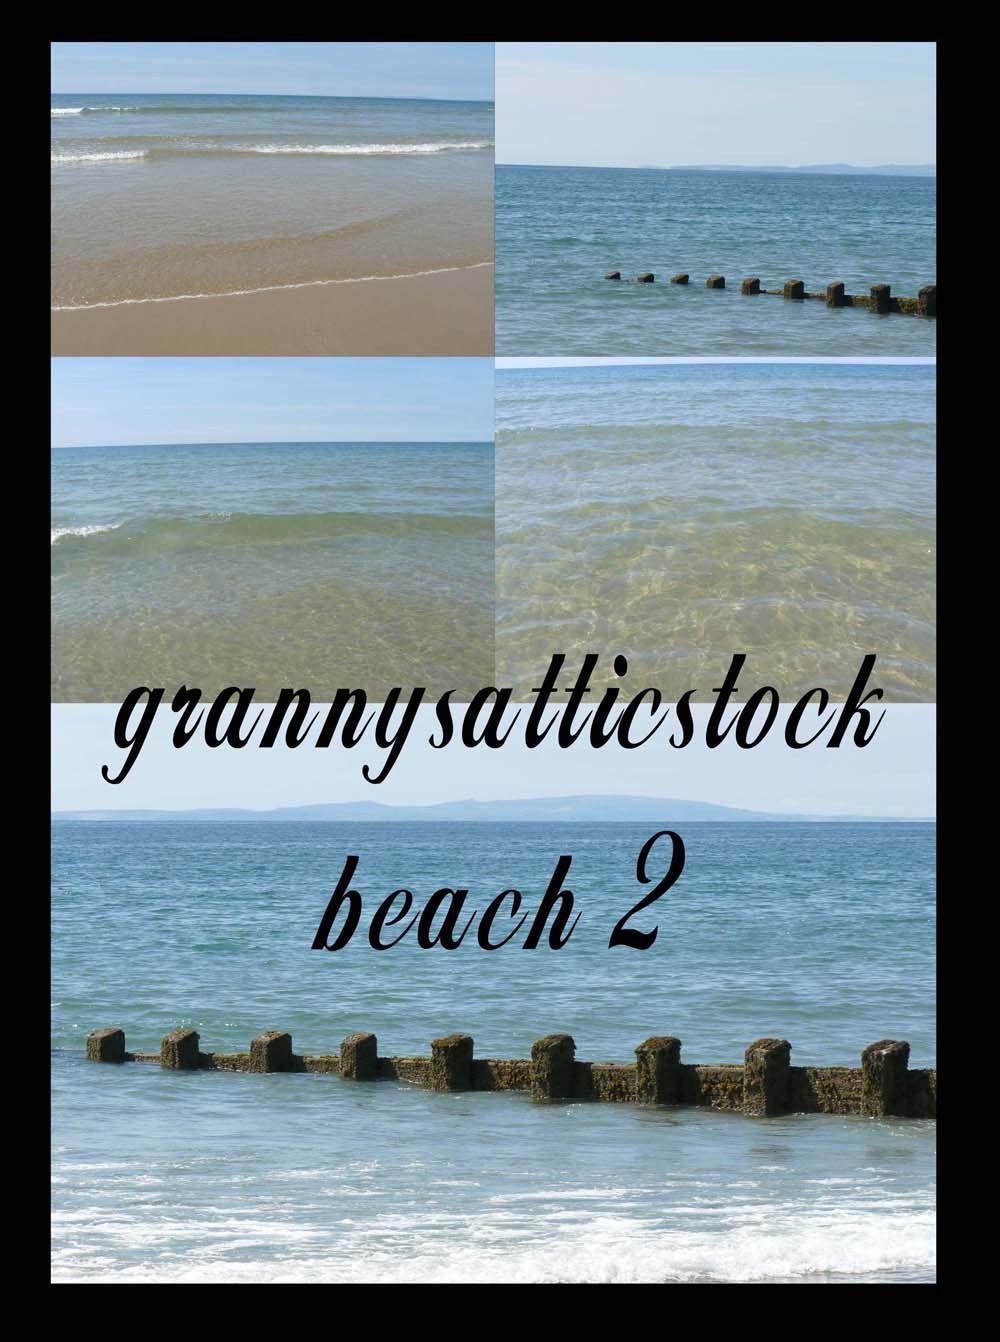 beach 2 by GRANNYSATTICSTOCK